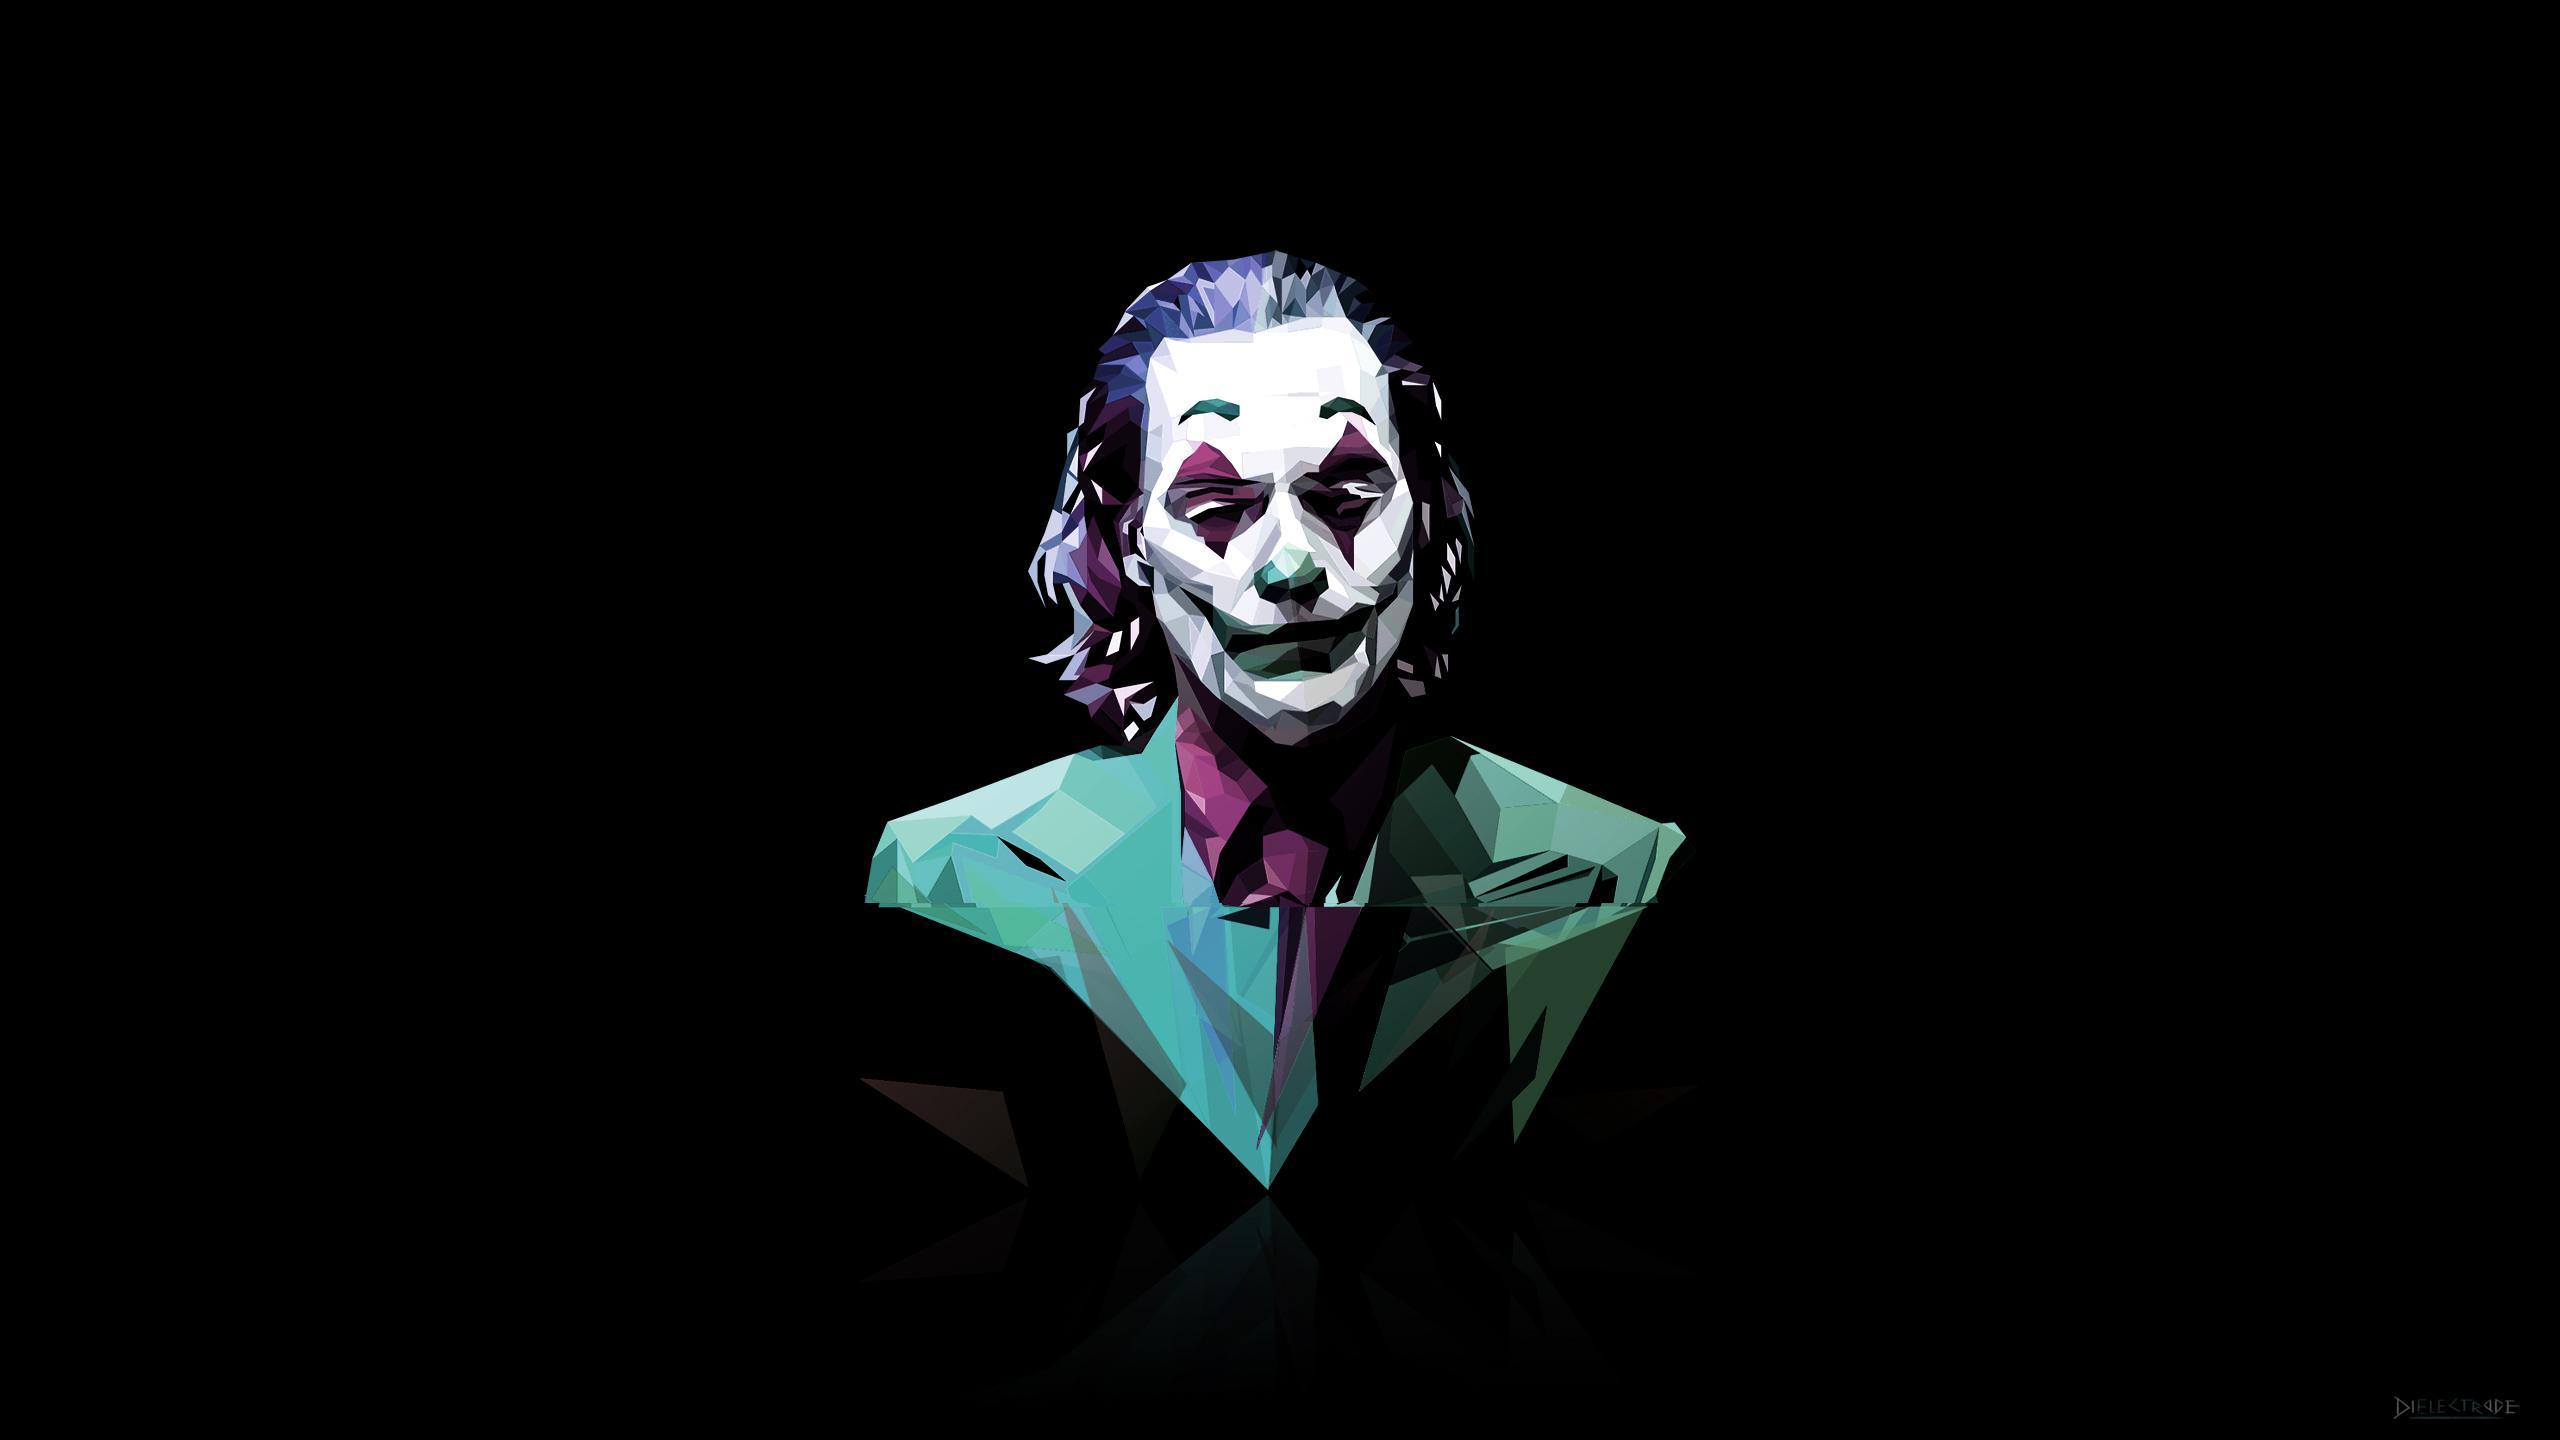 Joker Computer Wallpapers Wallpaper Cave